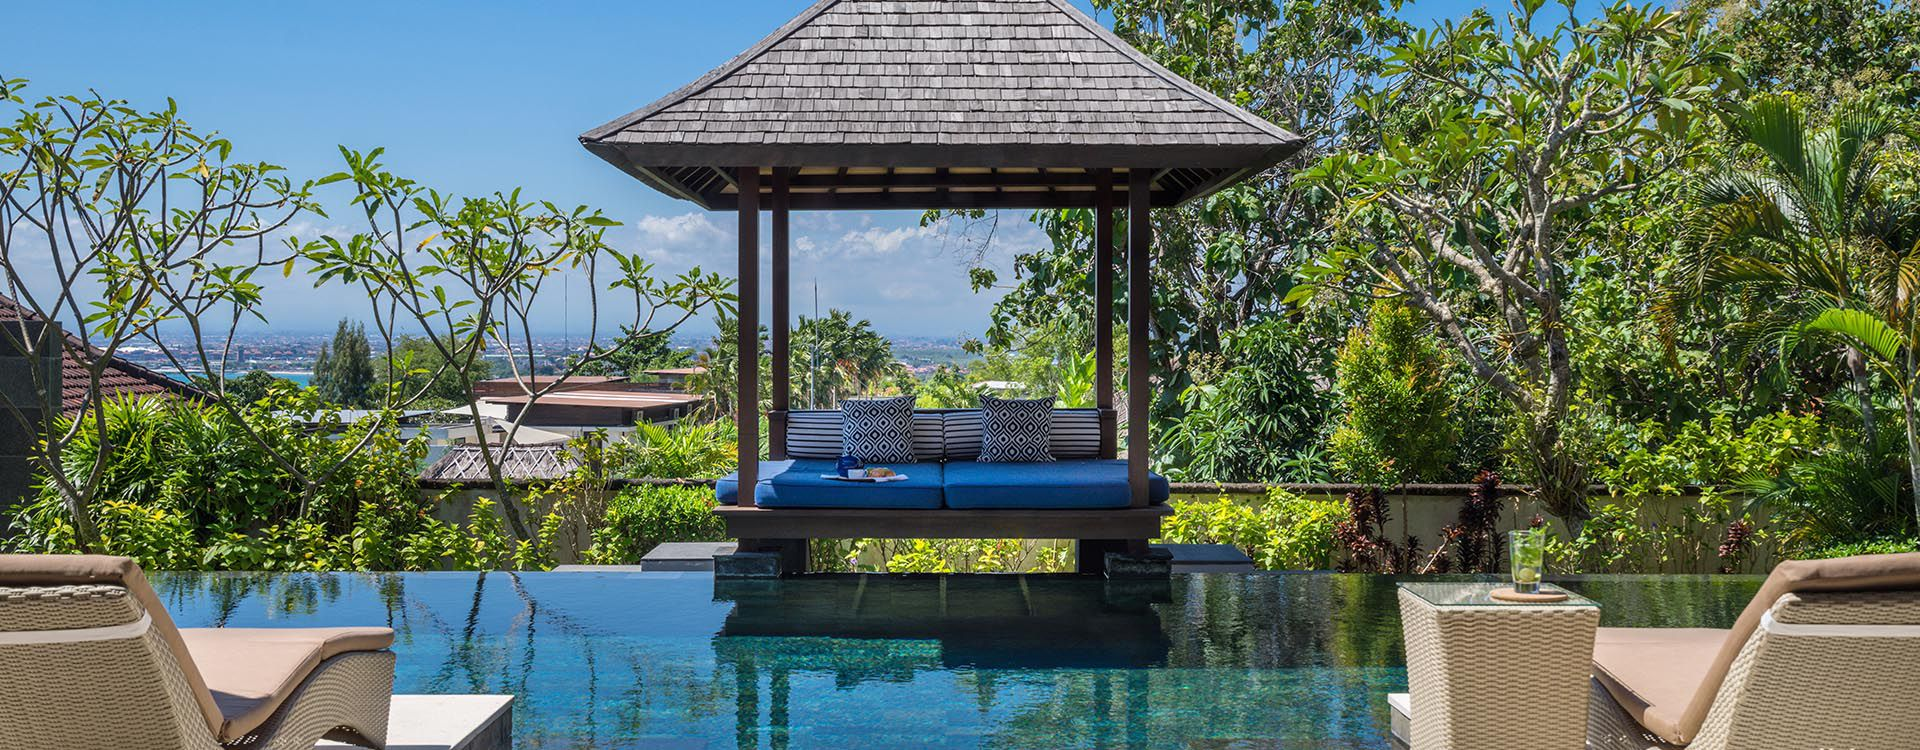 About Villa Adenium | Villa Adenium - Jimbaran 4 bedroom